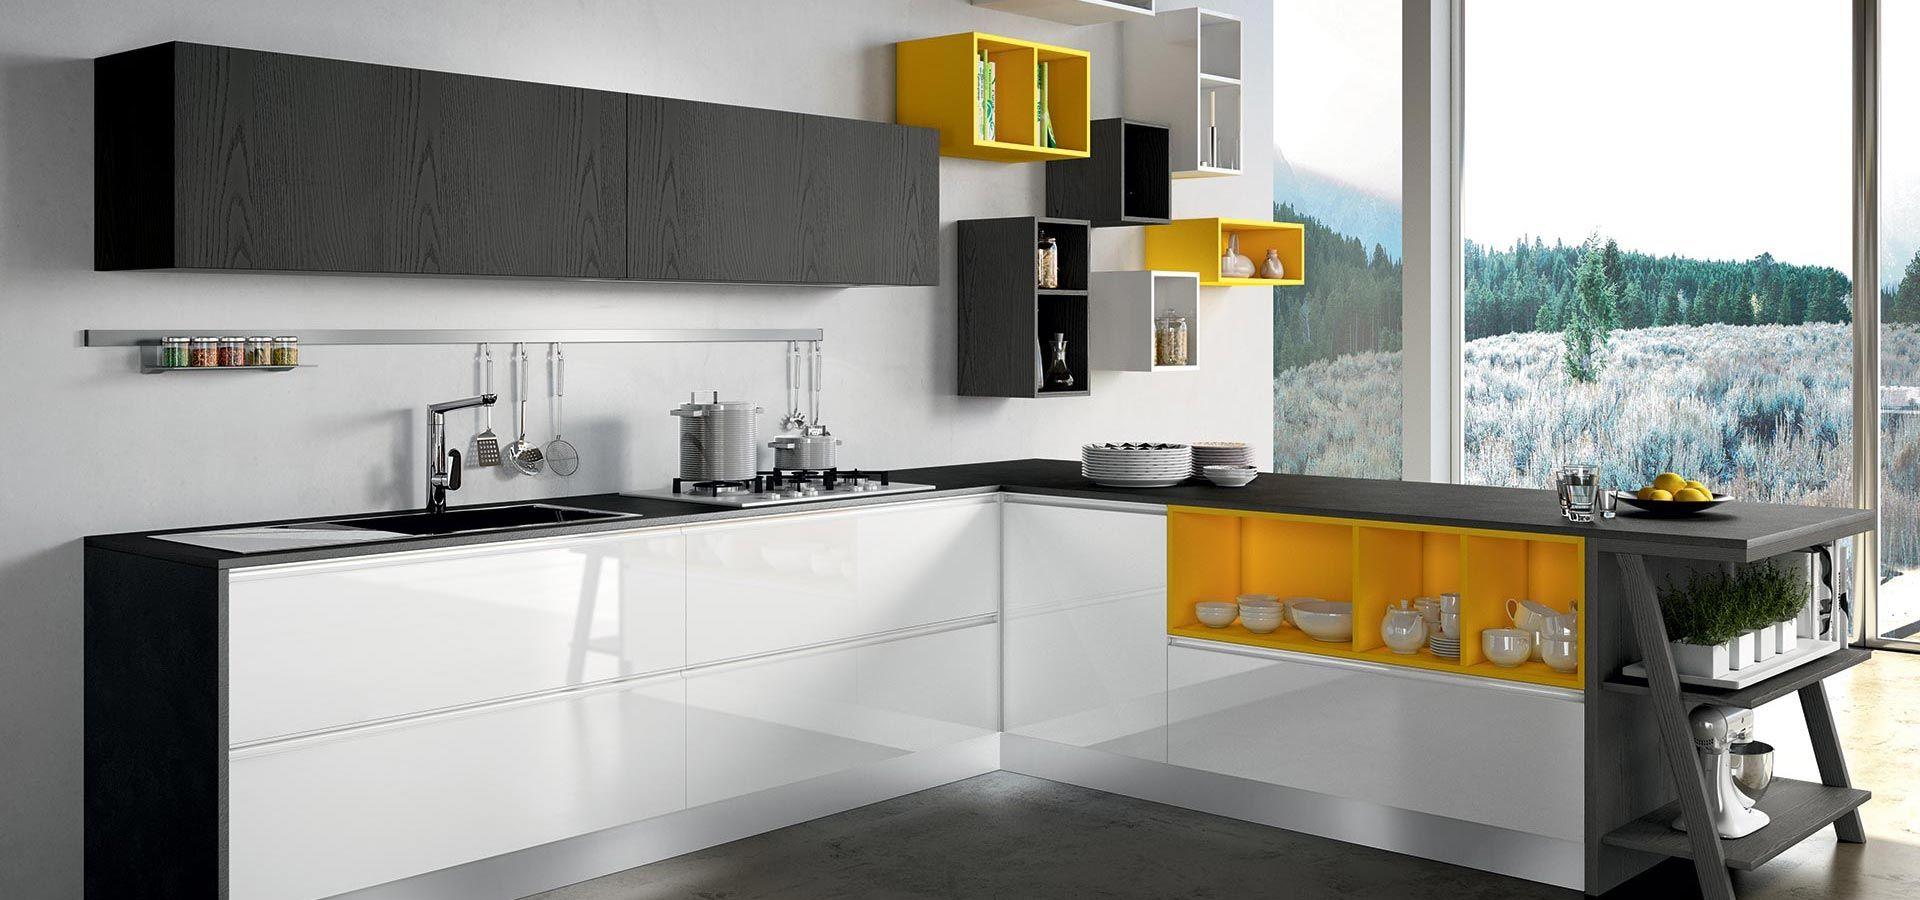 Cucina laccato bianco - Cucina laccato bianco ...